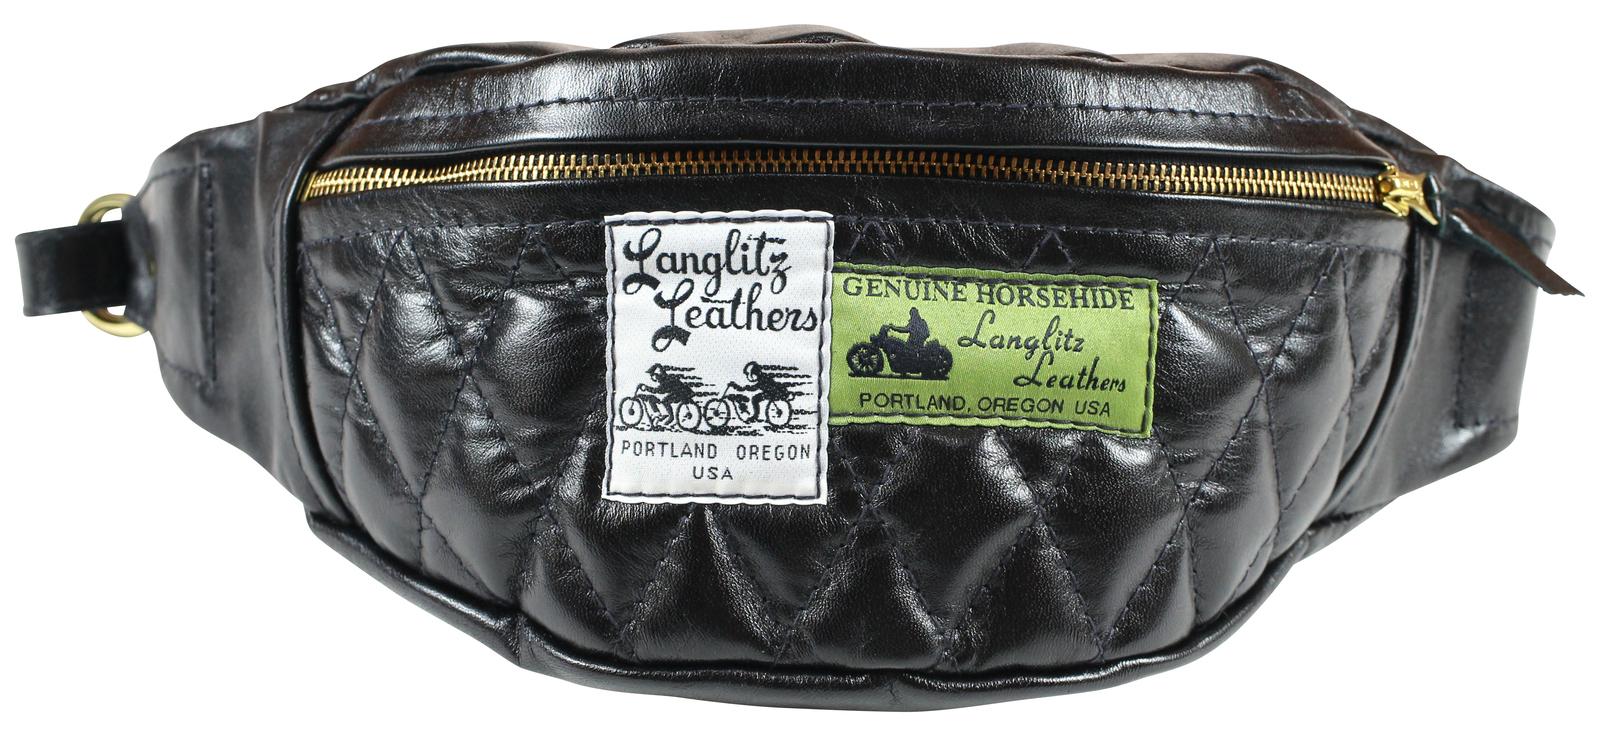 LanglitzLeathers [-Horsehide Hip Hugger inside Pocket- BLACK]